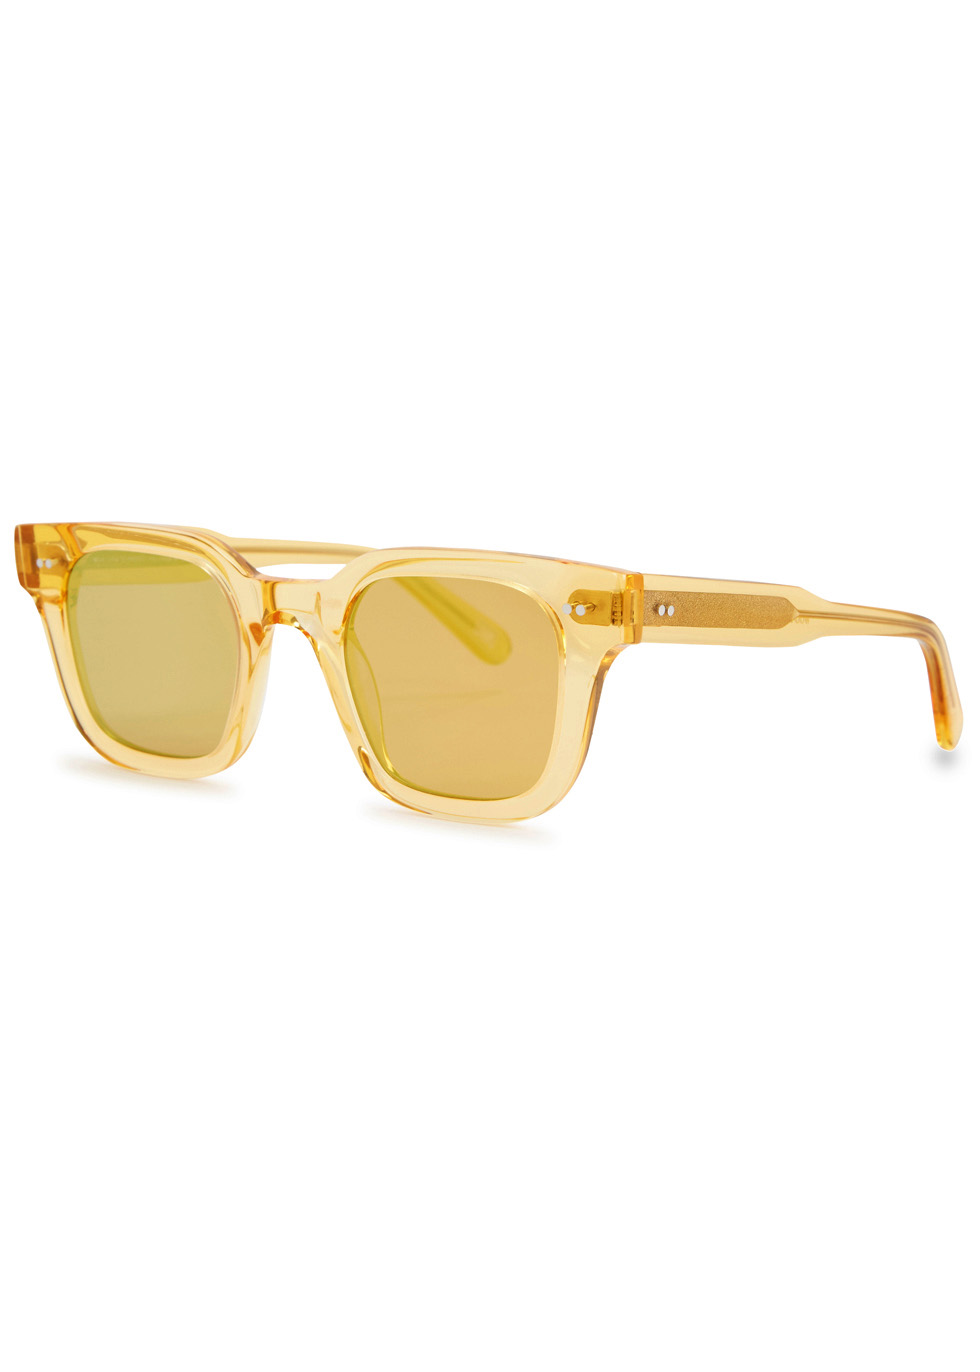 CHIMI 004 Wayfarer-Style Sunglasses in Yellow